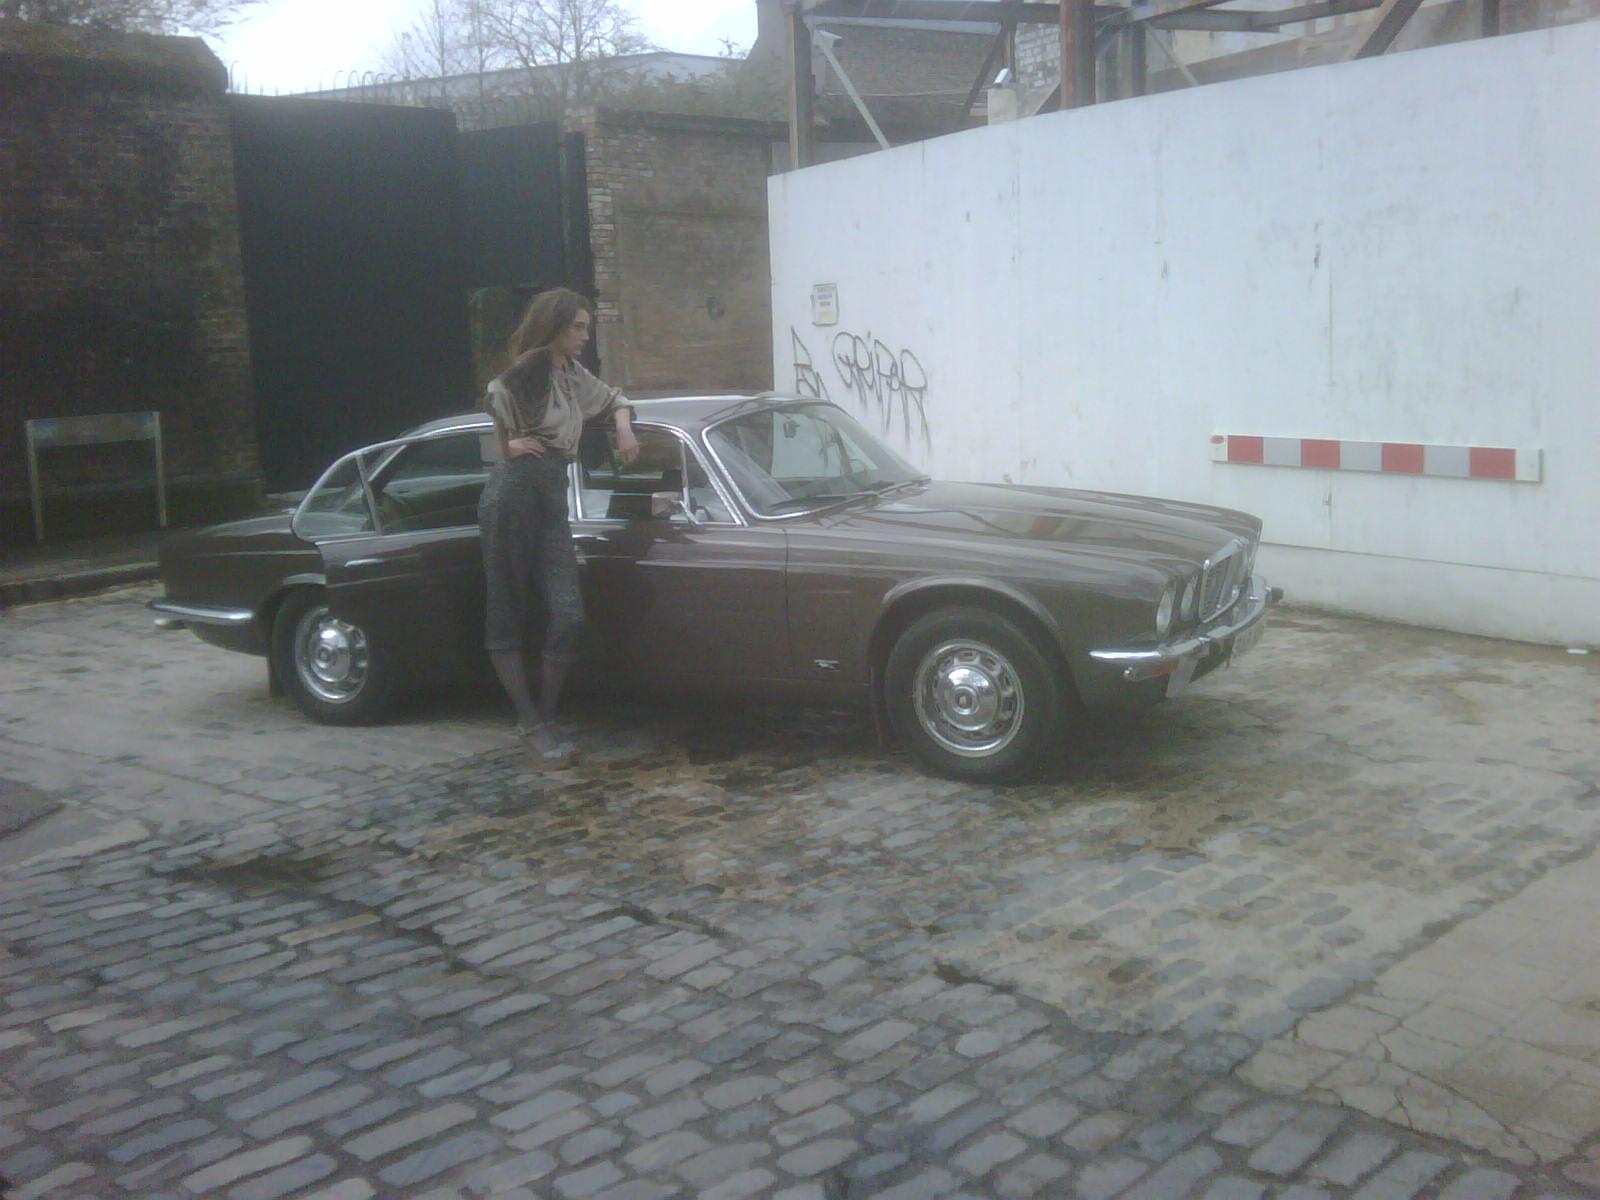 A 1974 Jaguar XJ6 saloon from